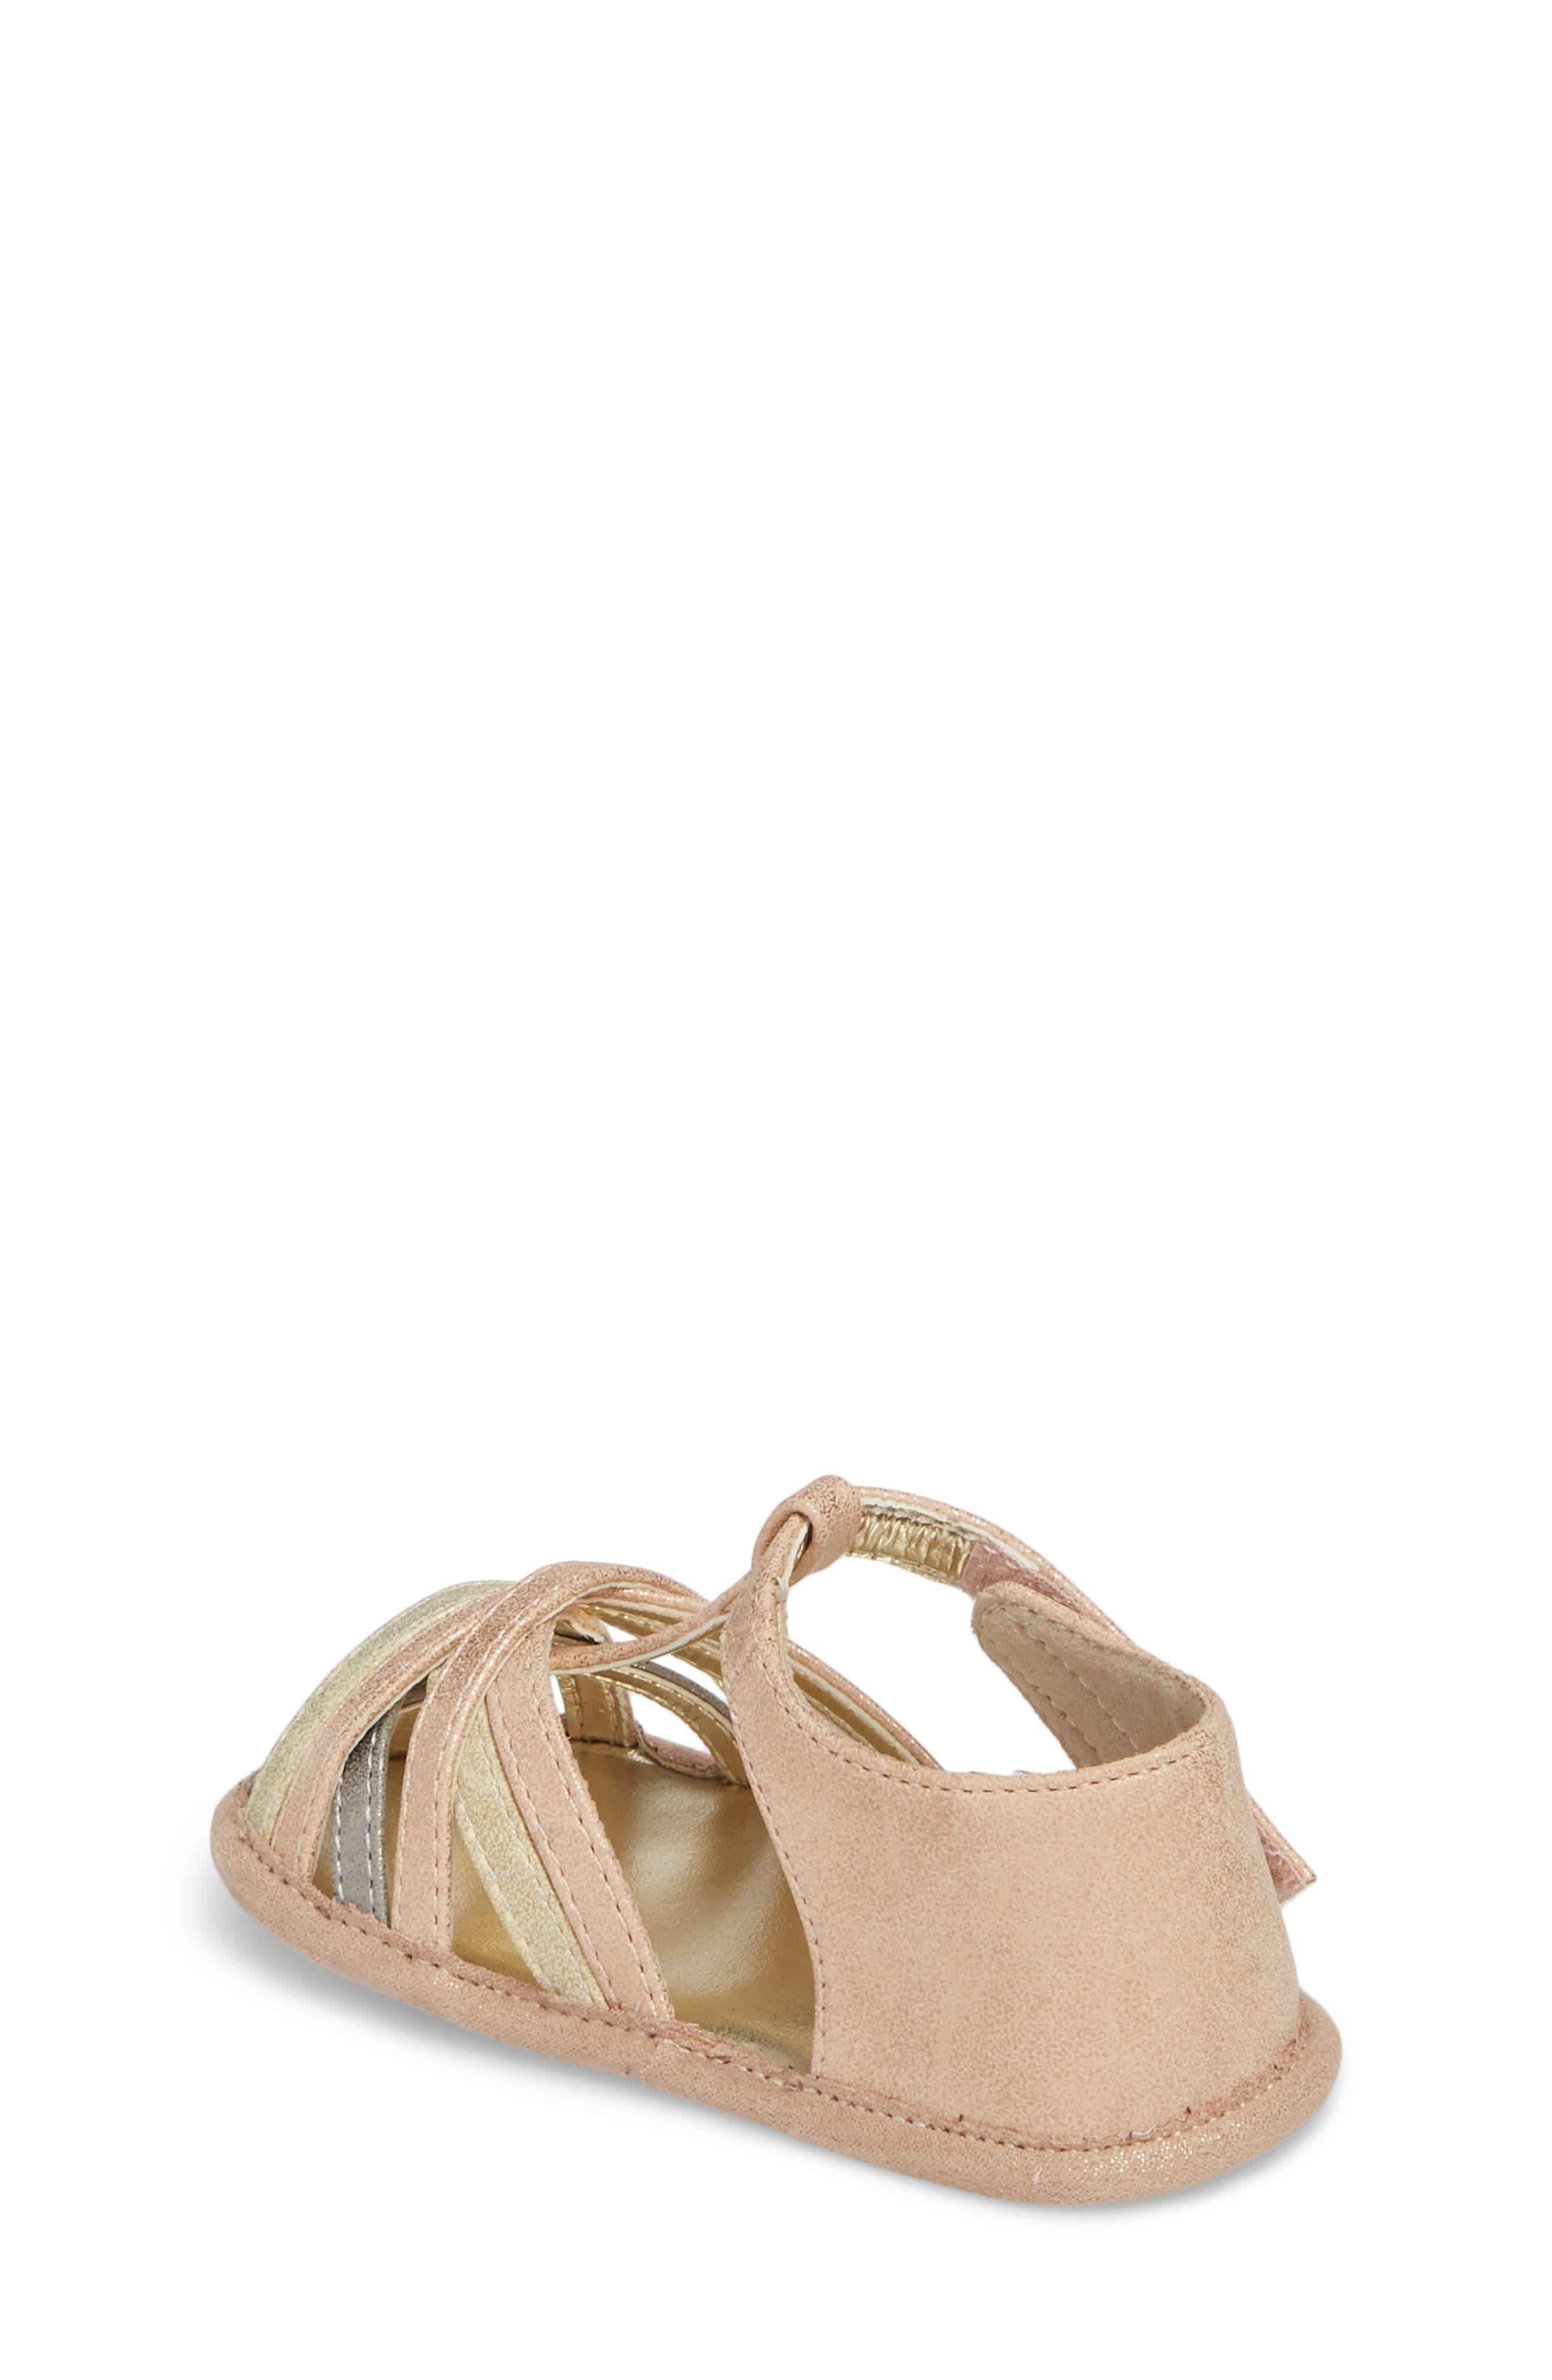 Wisp Metallic Sandal,                             Alternate thumbnail 2, color,                             Rose Gold